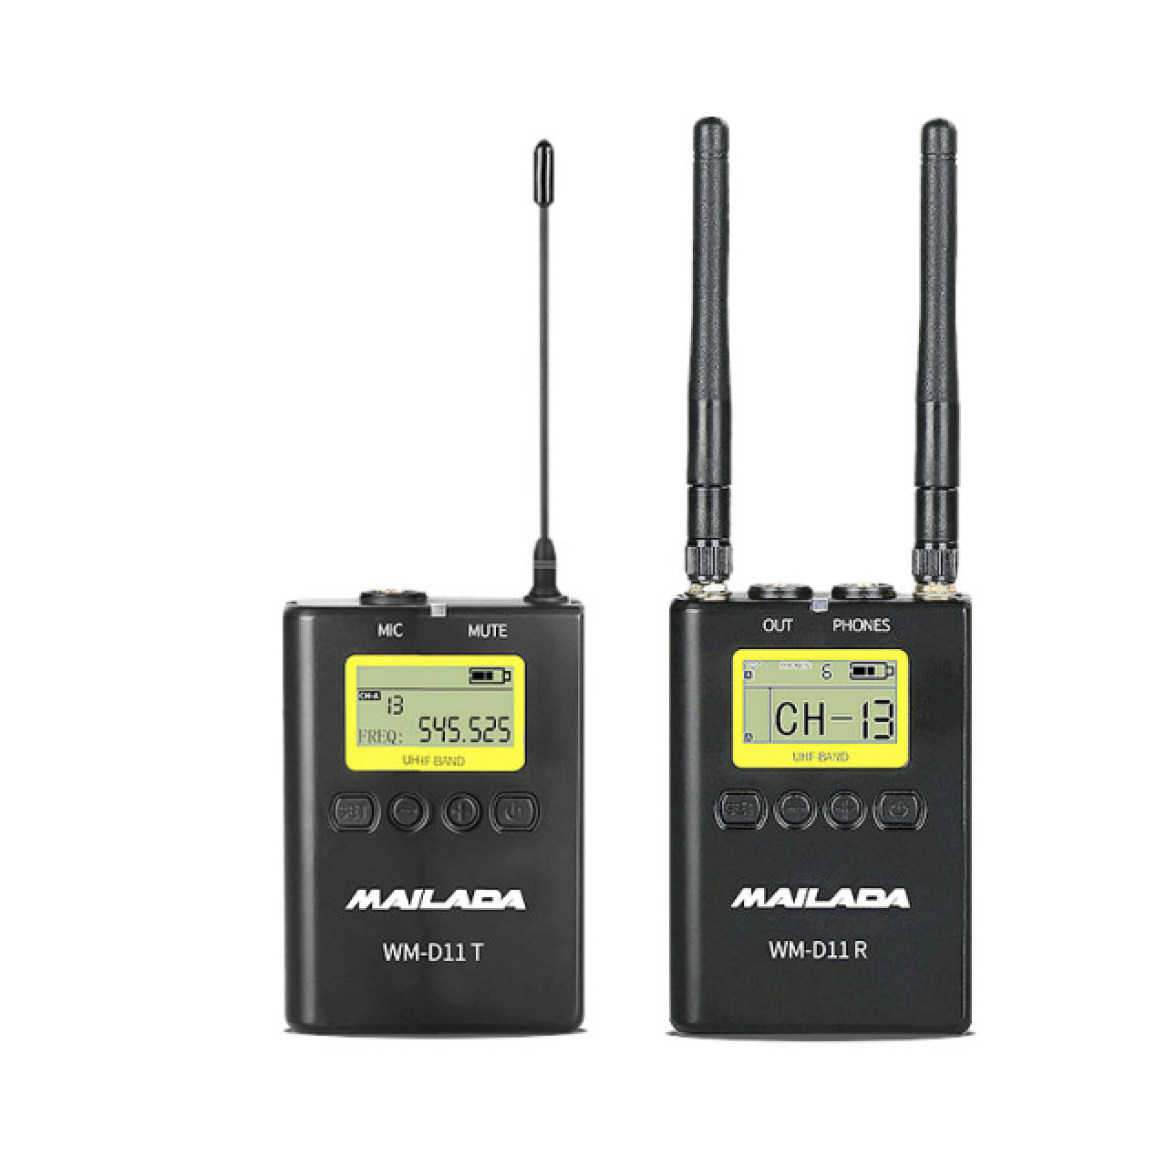 Professional wireless microphone Mailada WM-D10